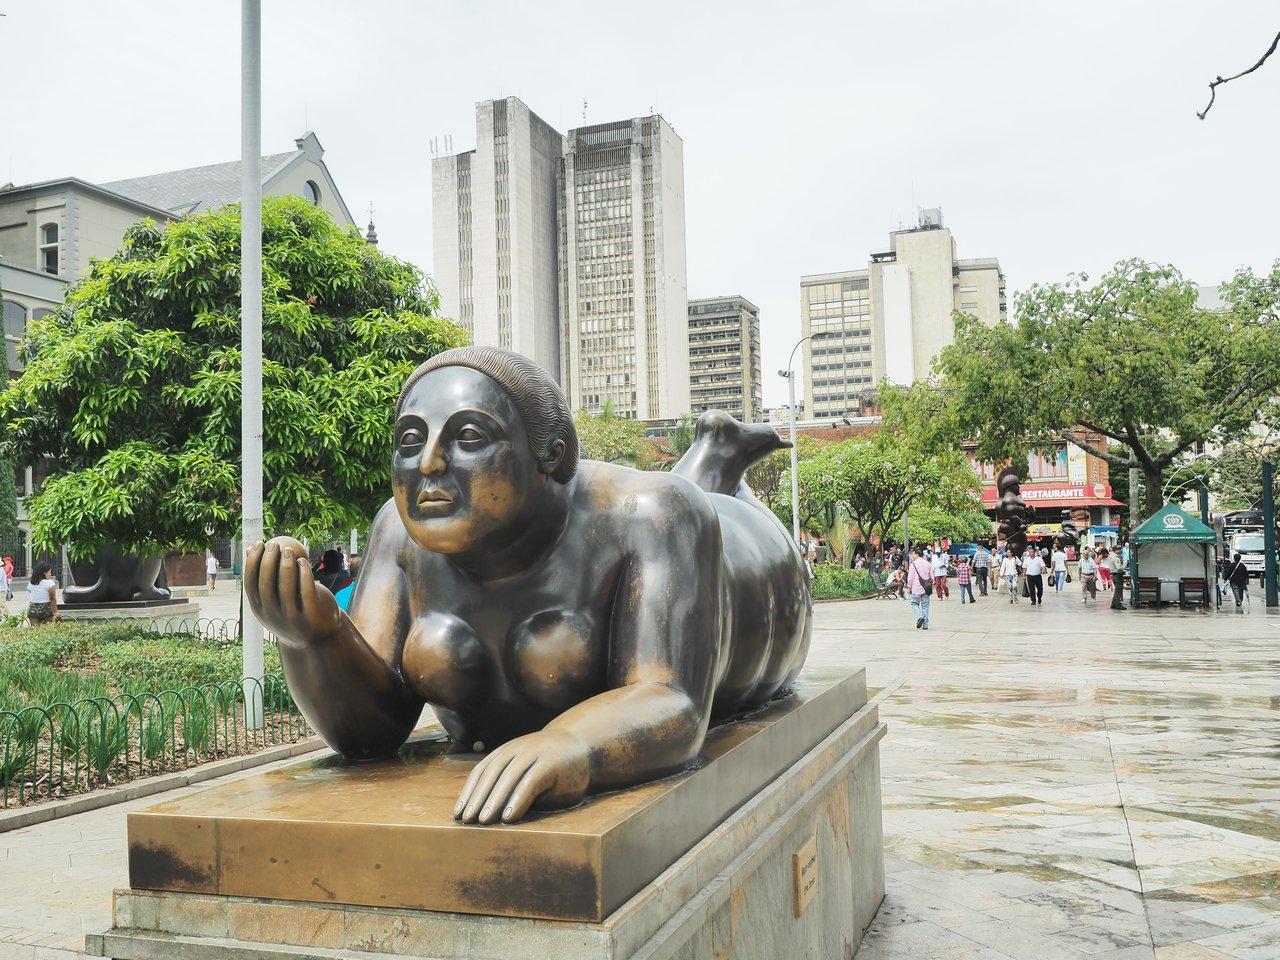 Medellin | Photo taken by Peter G